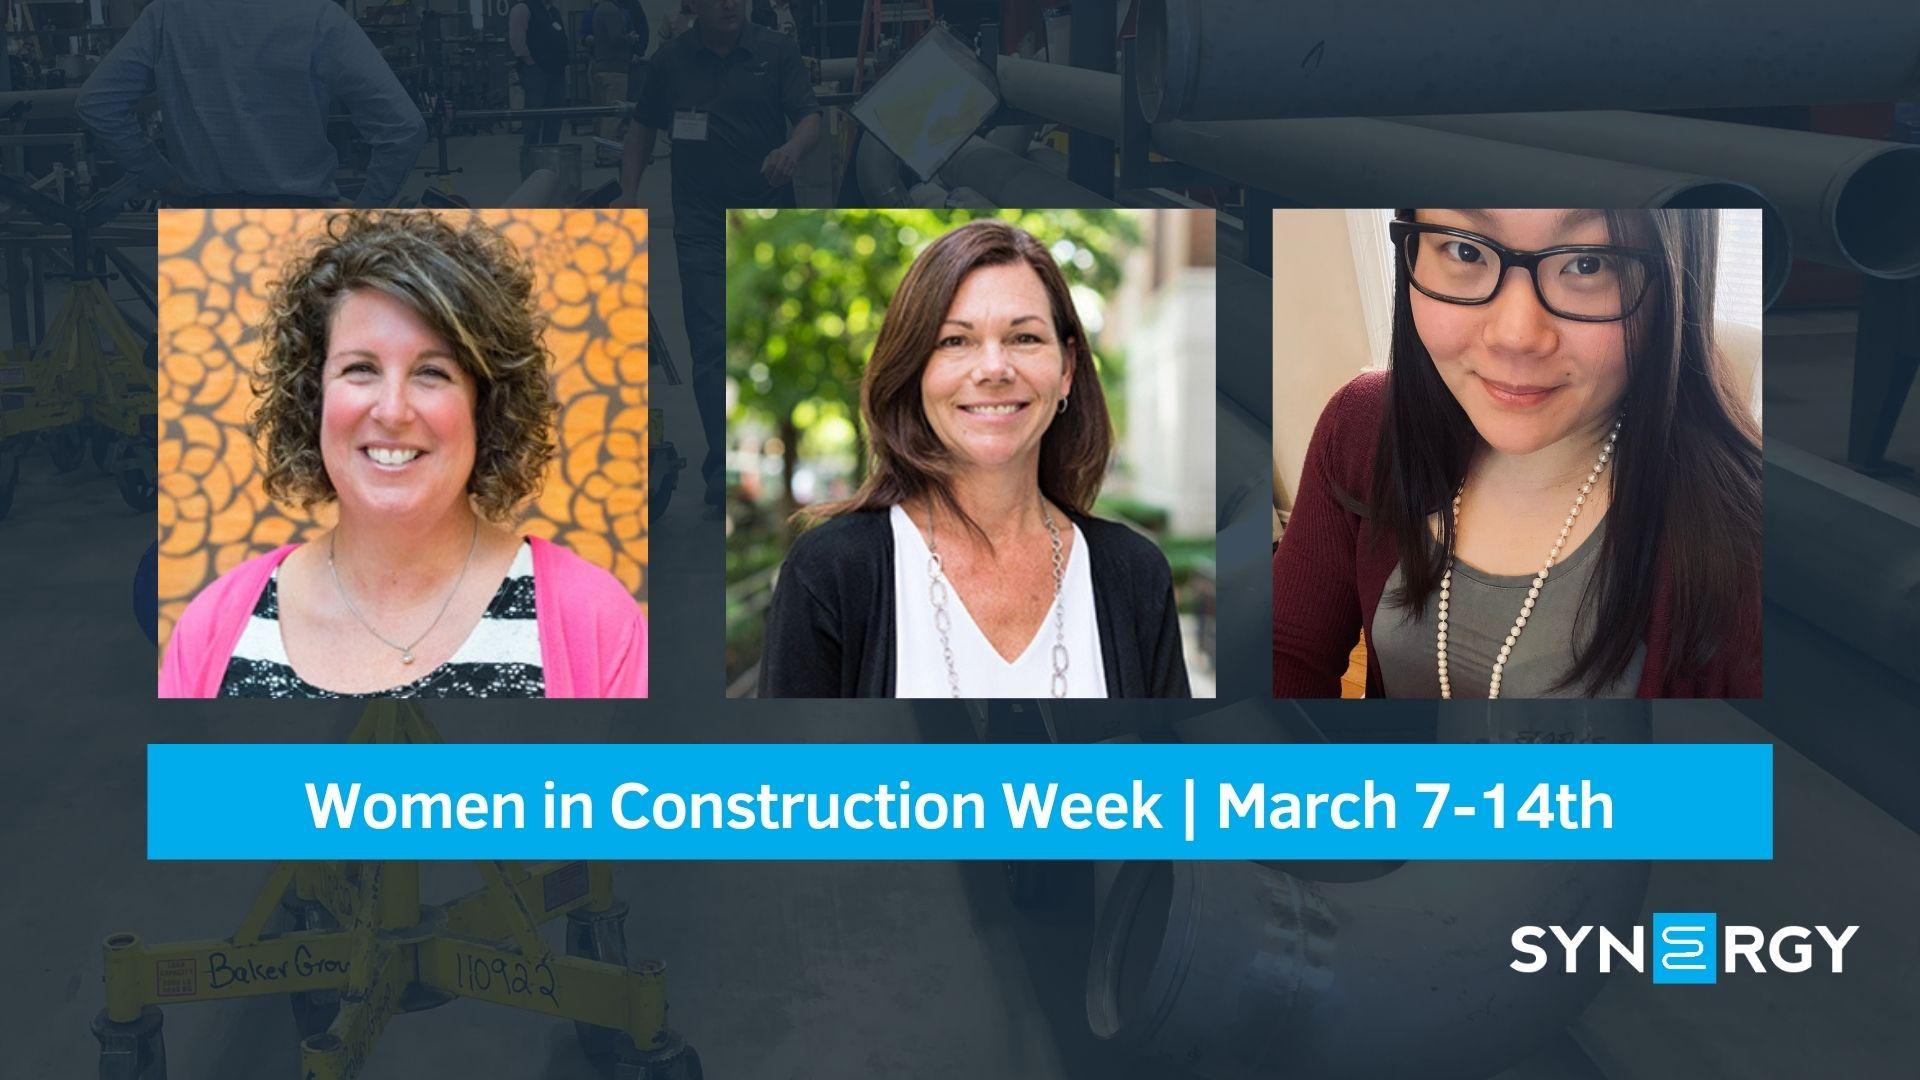 Synergy Celebrates Women in Construction Week